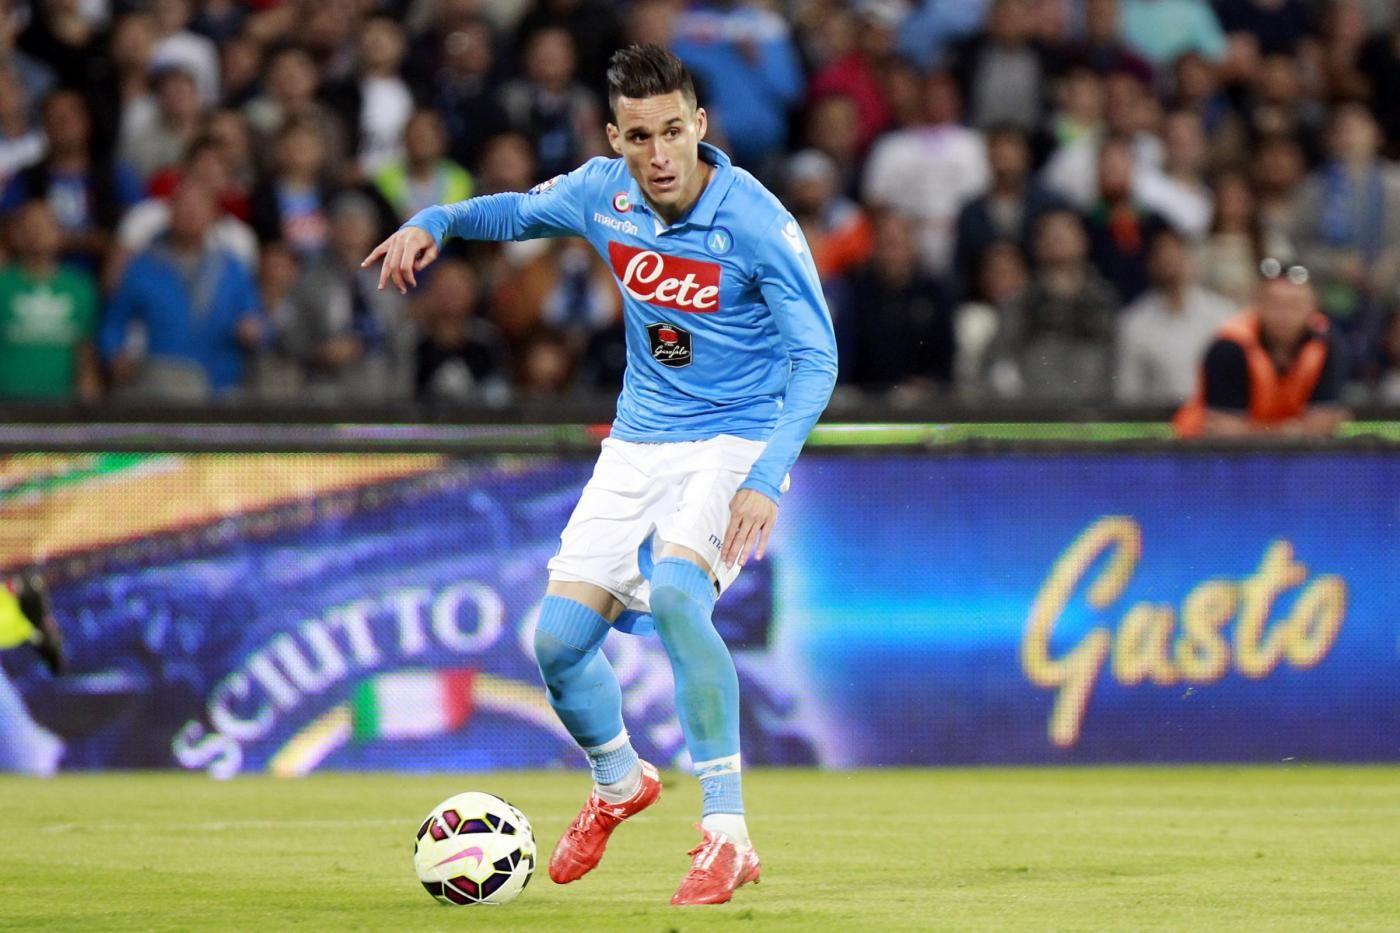 Europa League, Napoli travolge Bruges 5-0: bene Mertens e Callejon